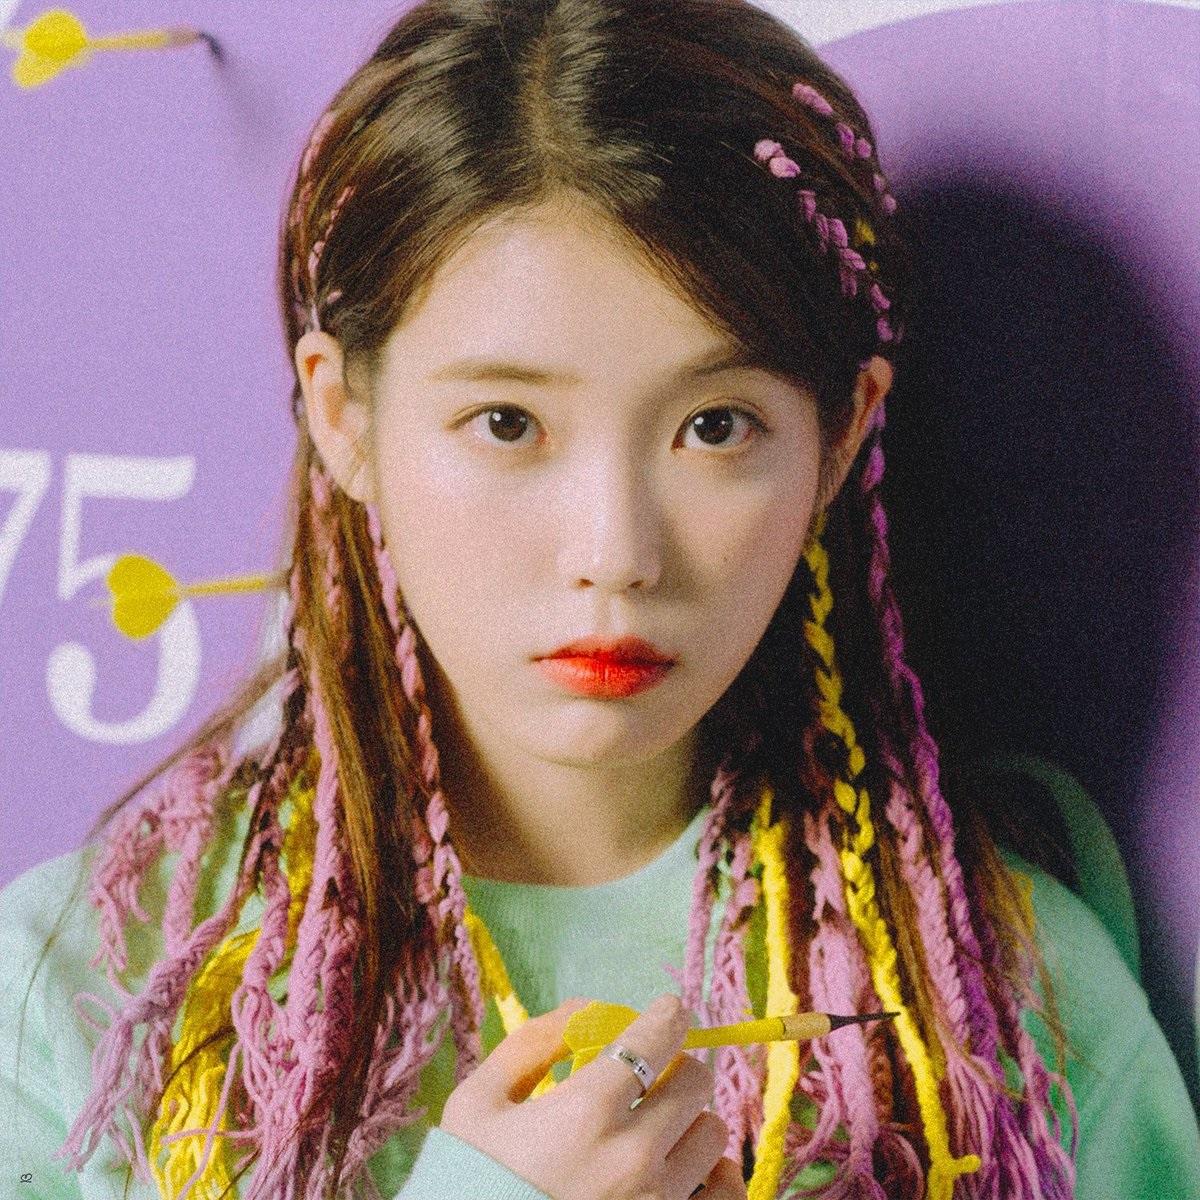 Category:Female soloists | Kpop Wiki | FANDOM powered by Wikia